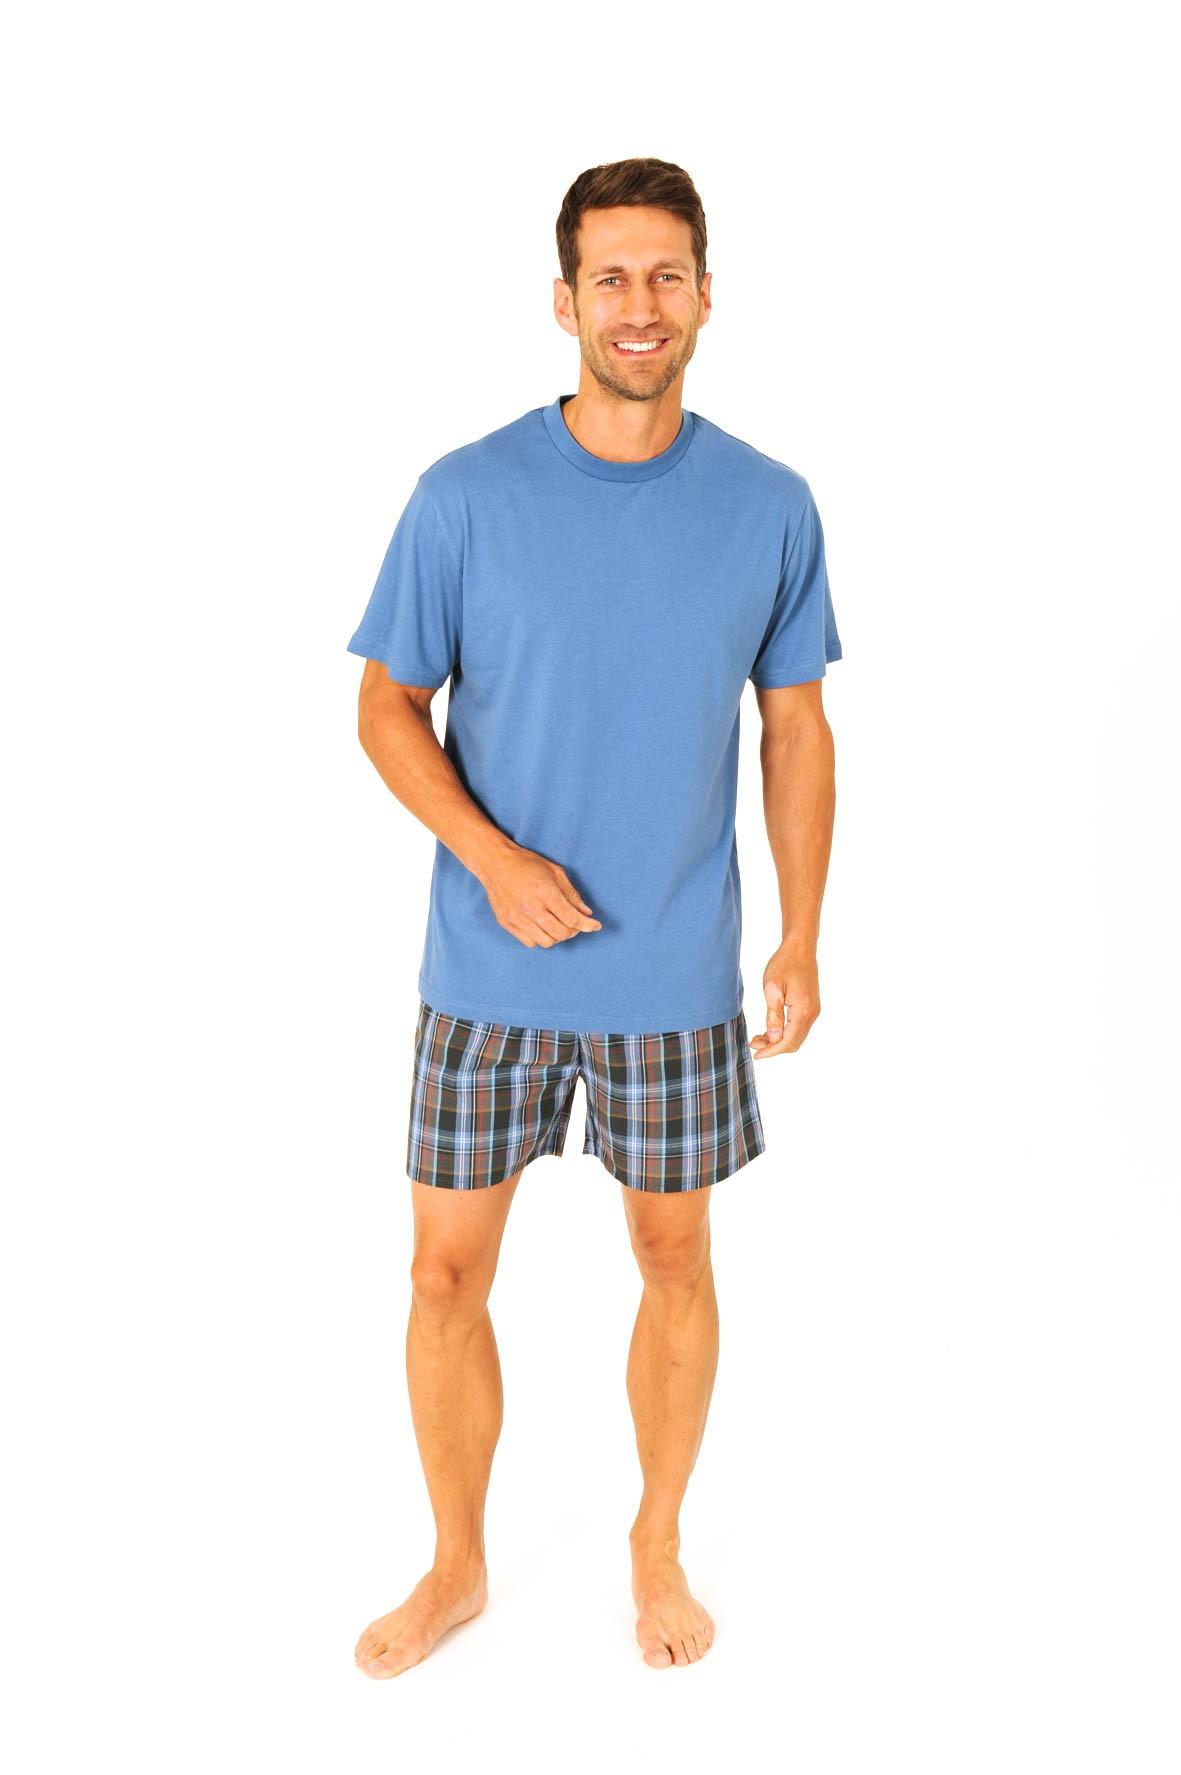 Herren Pyjama Shorty Mix & Match - Schlafanzug kurz - Hose gewebt, Oberteil Wirkware